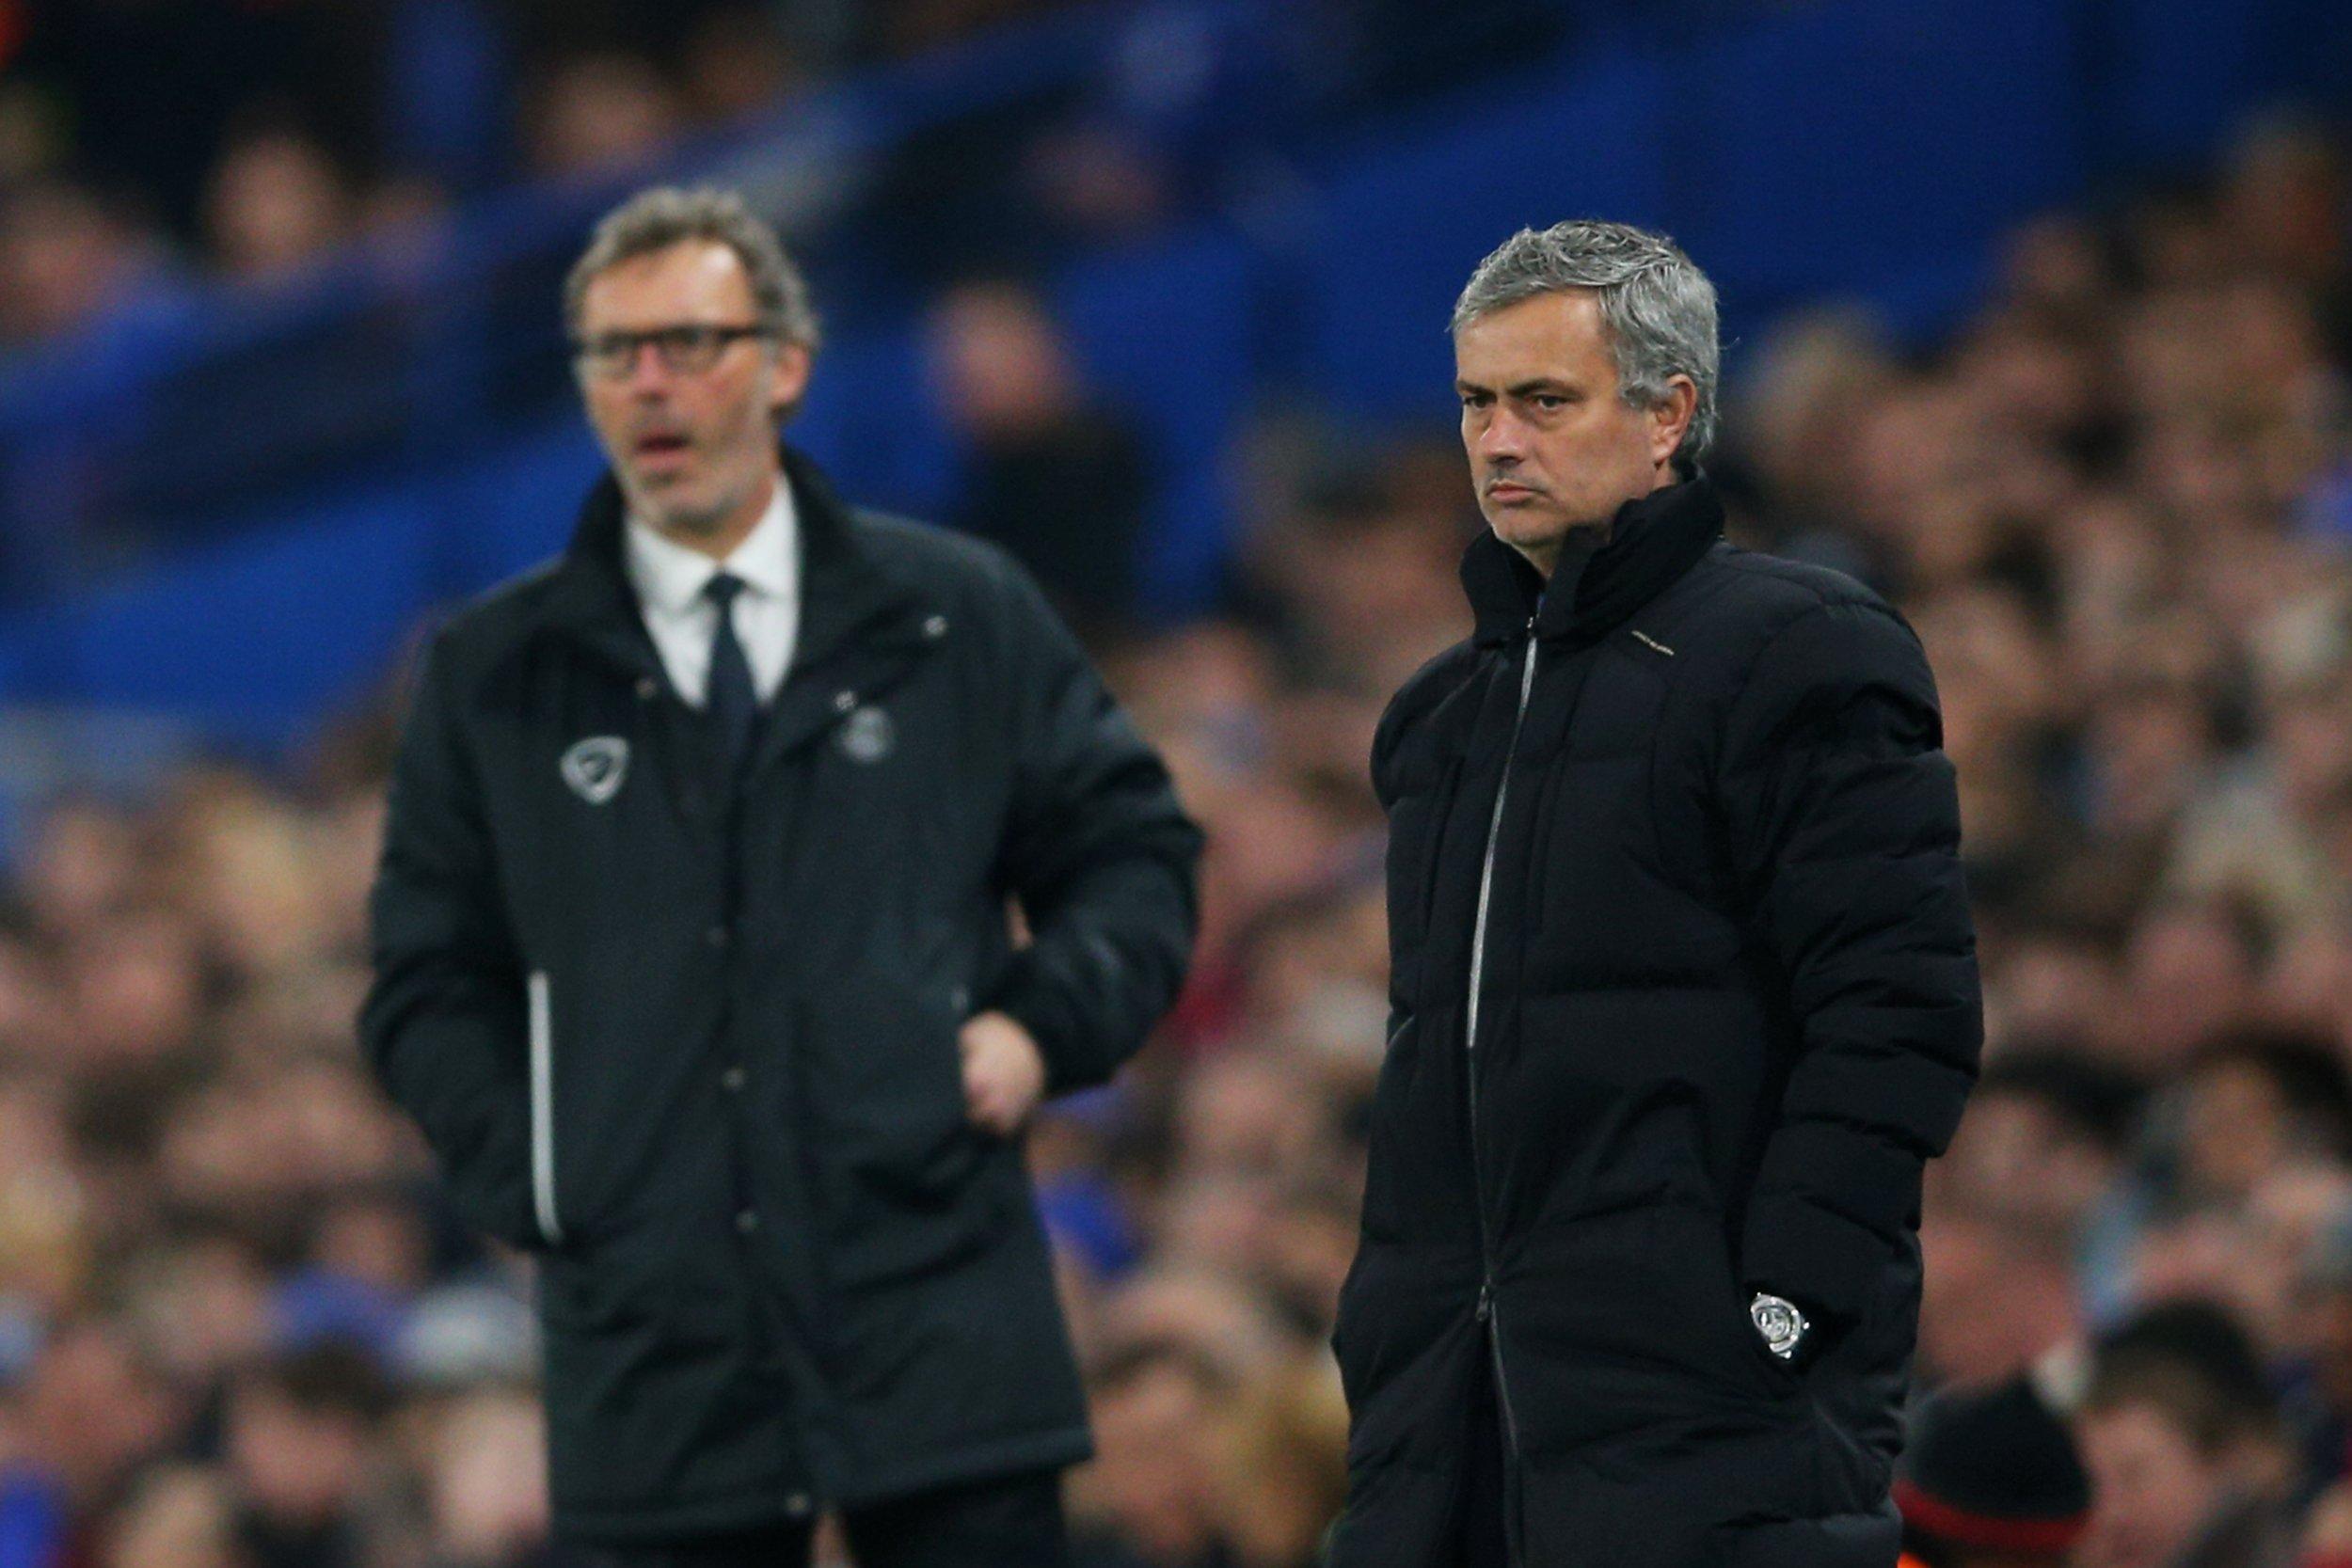 Jose Mourinho, right, could replace Laurent Blanc as Paris Saint-Germain manager.